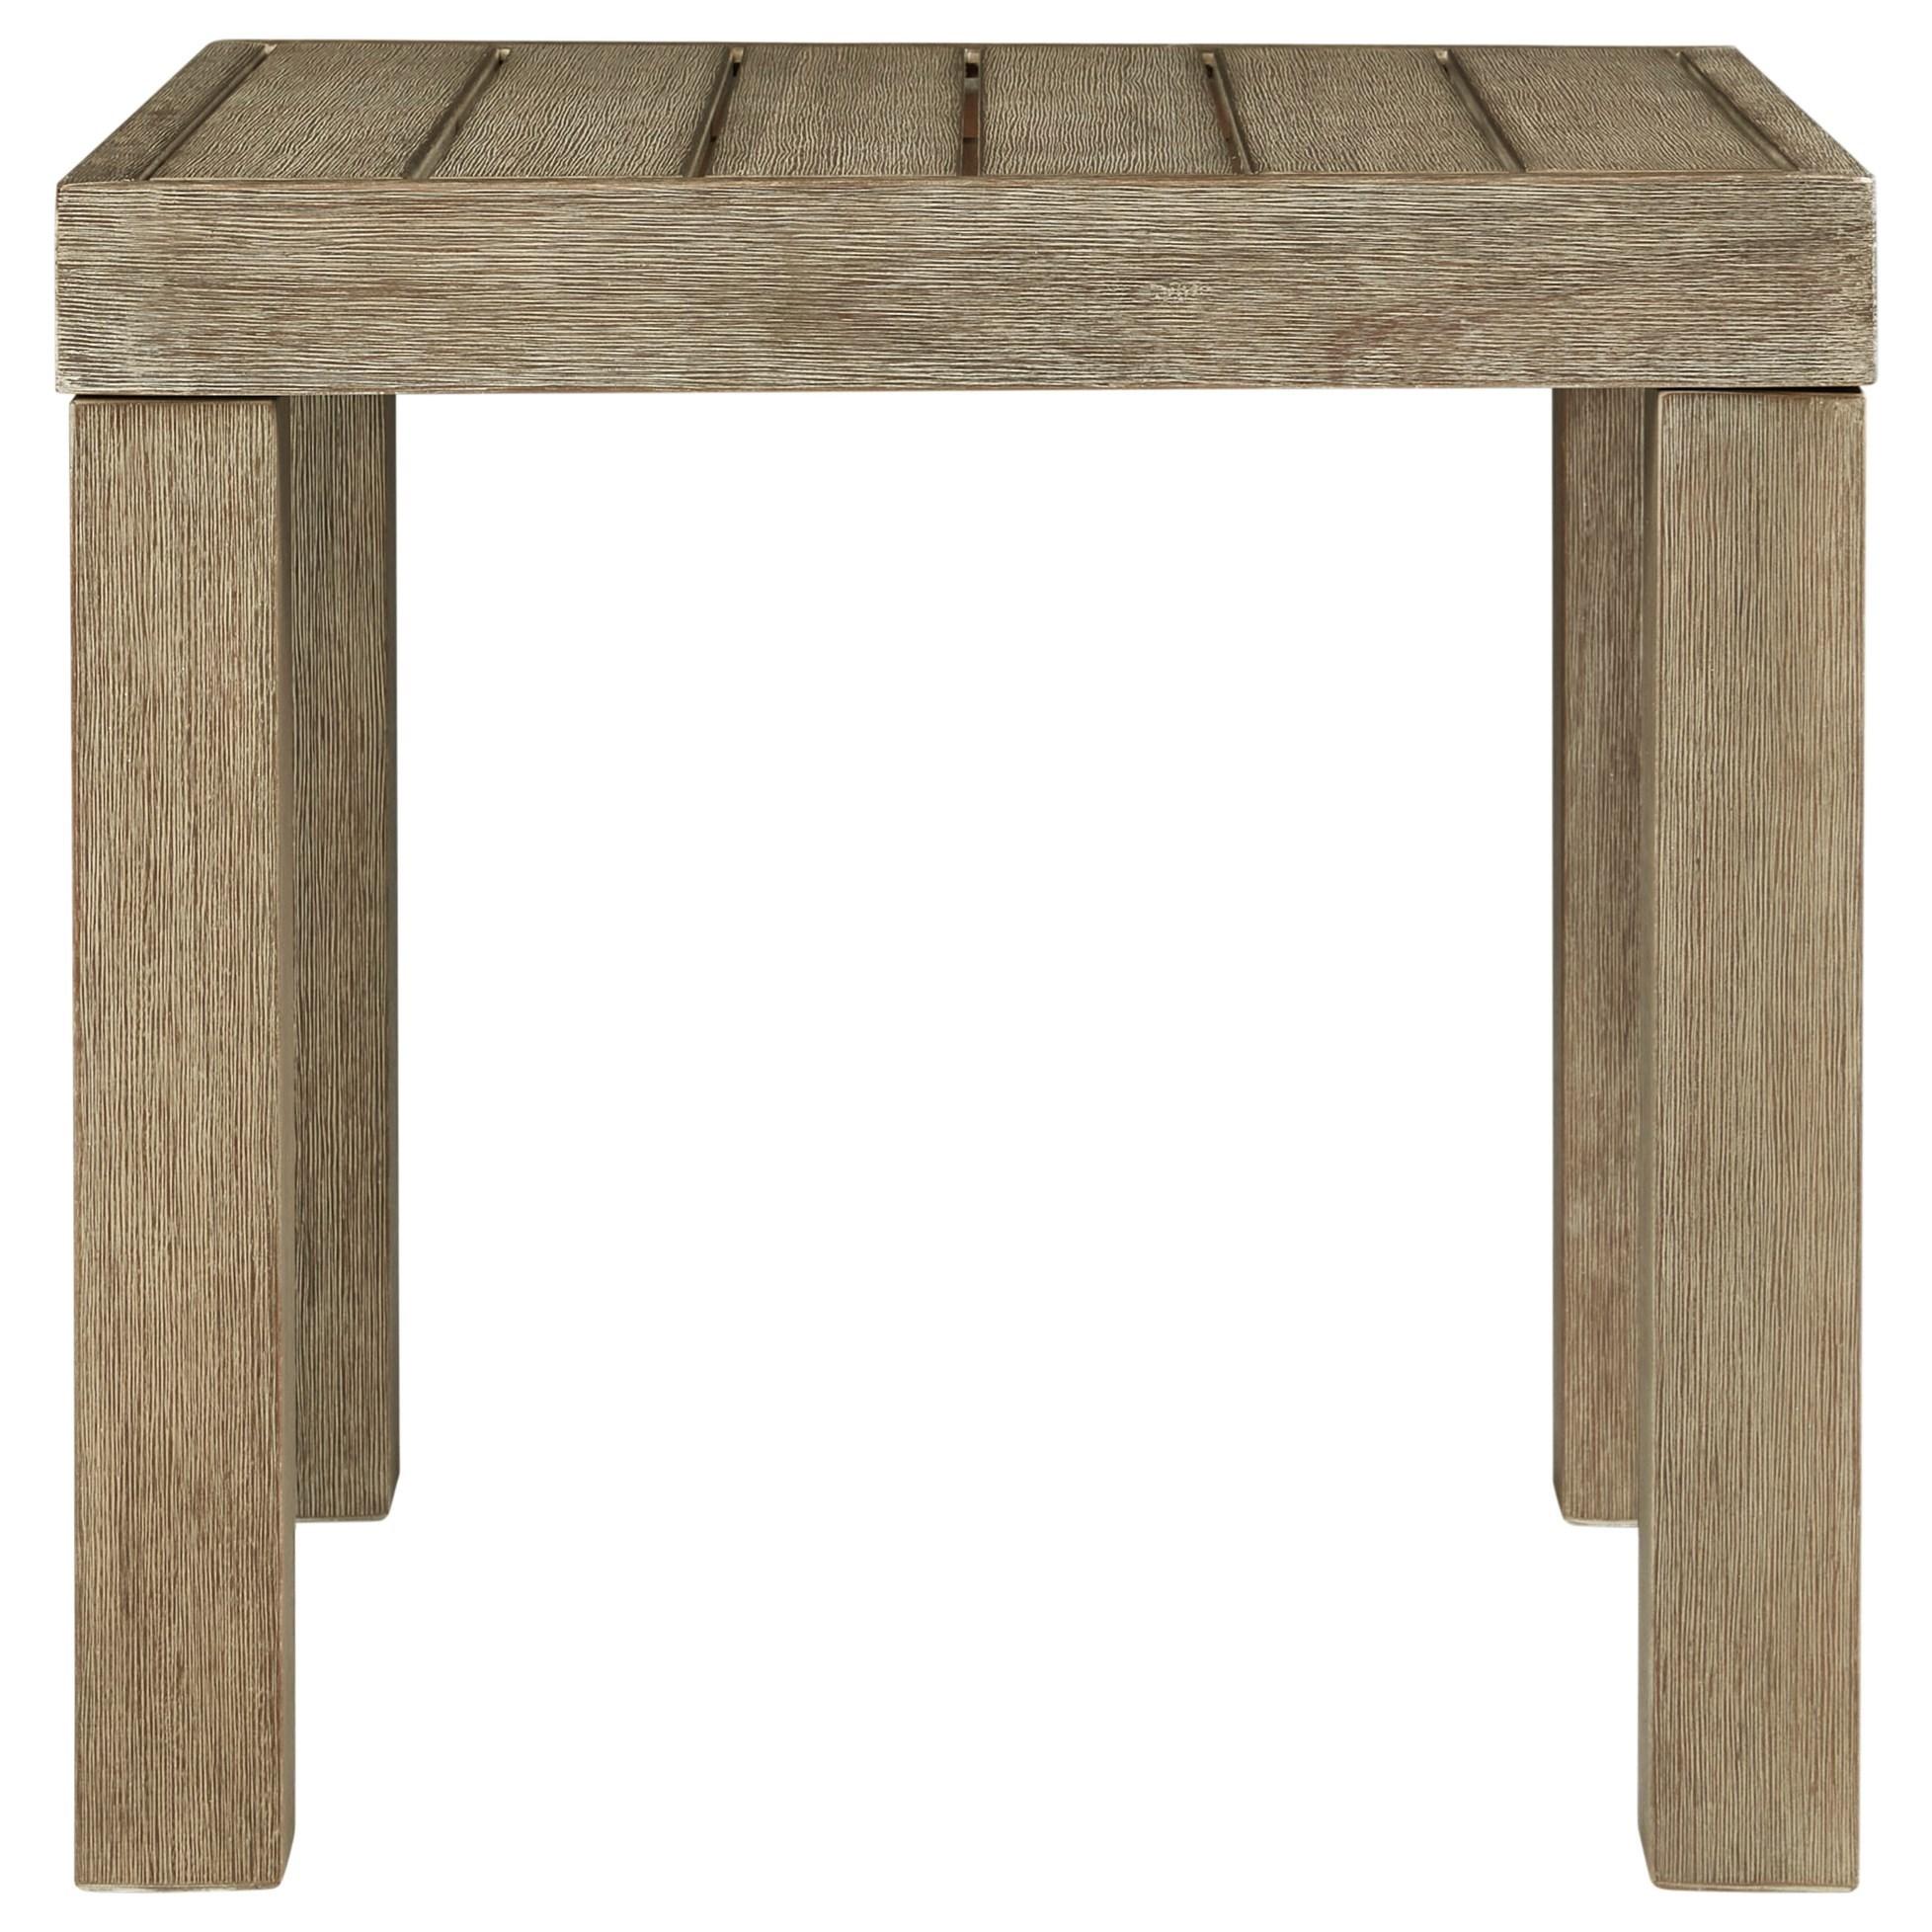 Eucalyptus Wood Square End Table